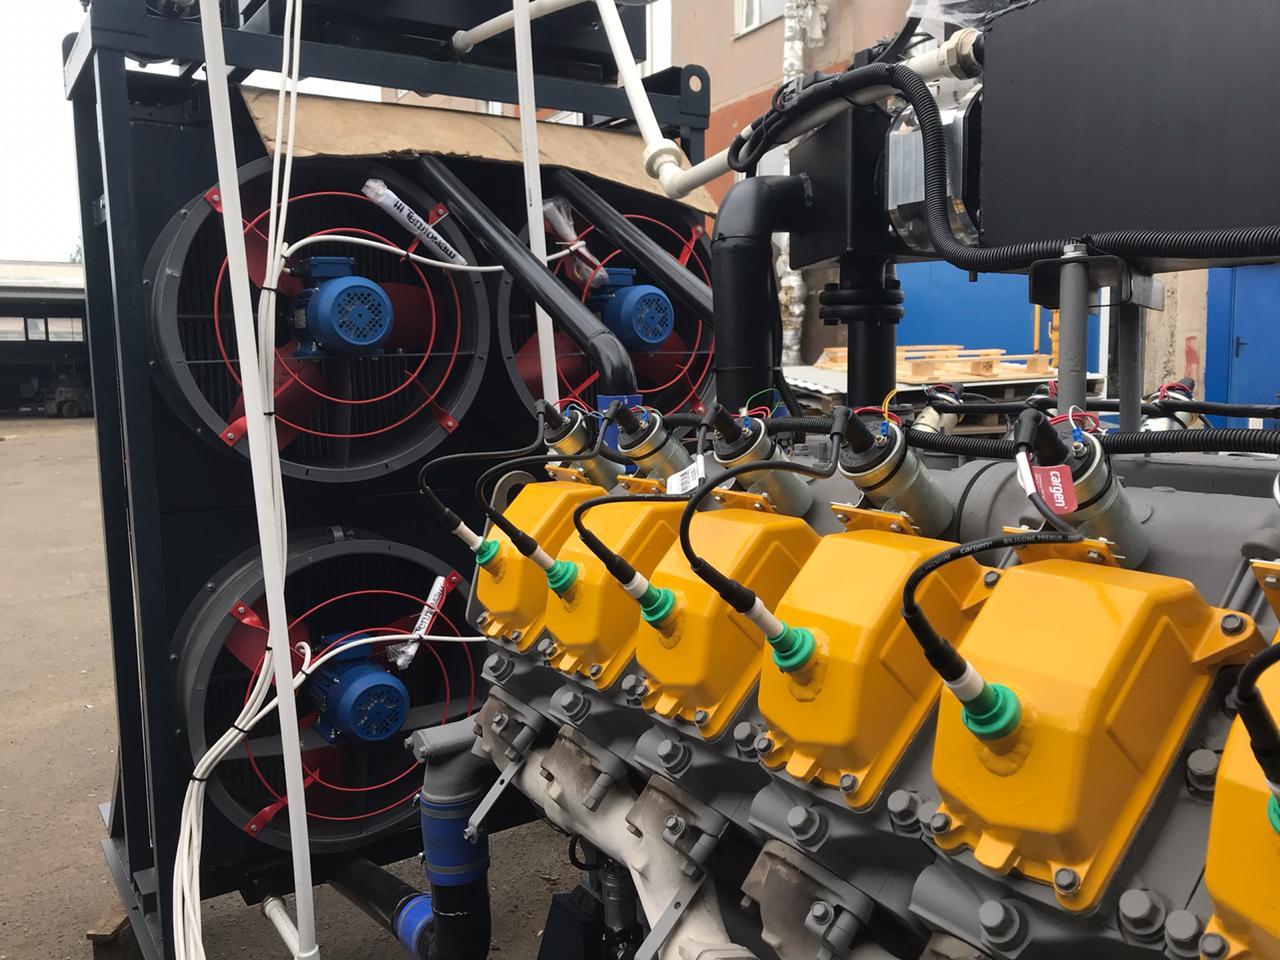 ГПУ 1200 кВт двигатель ЯМЗ-8503